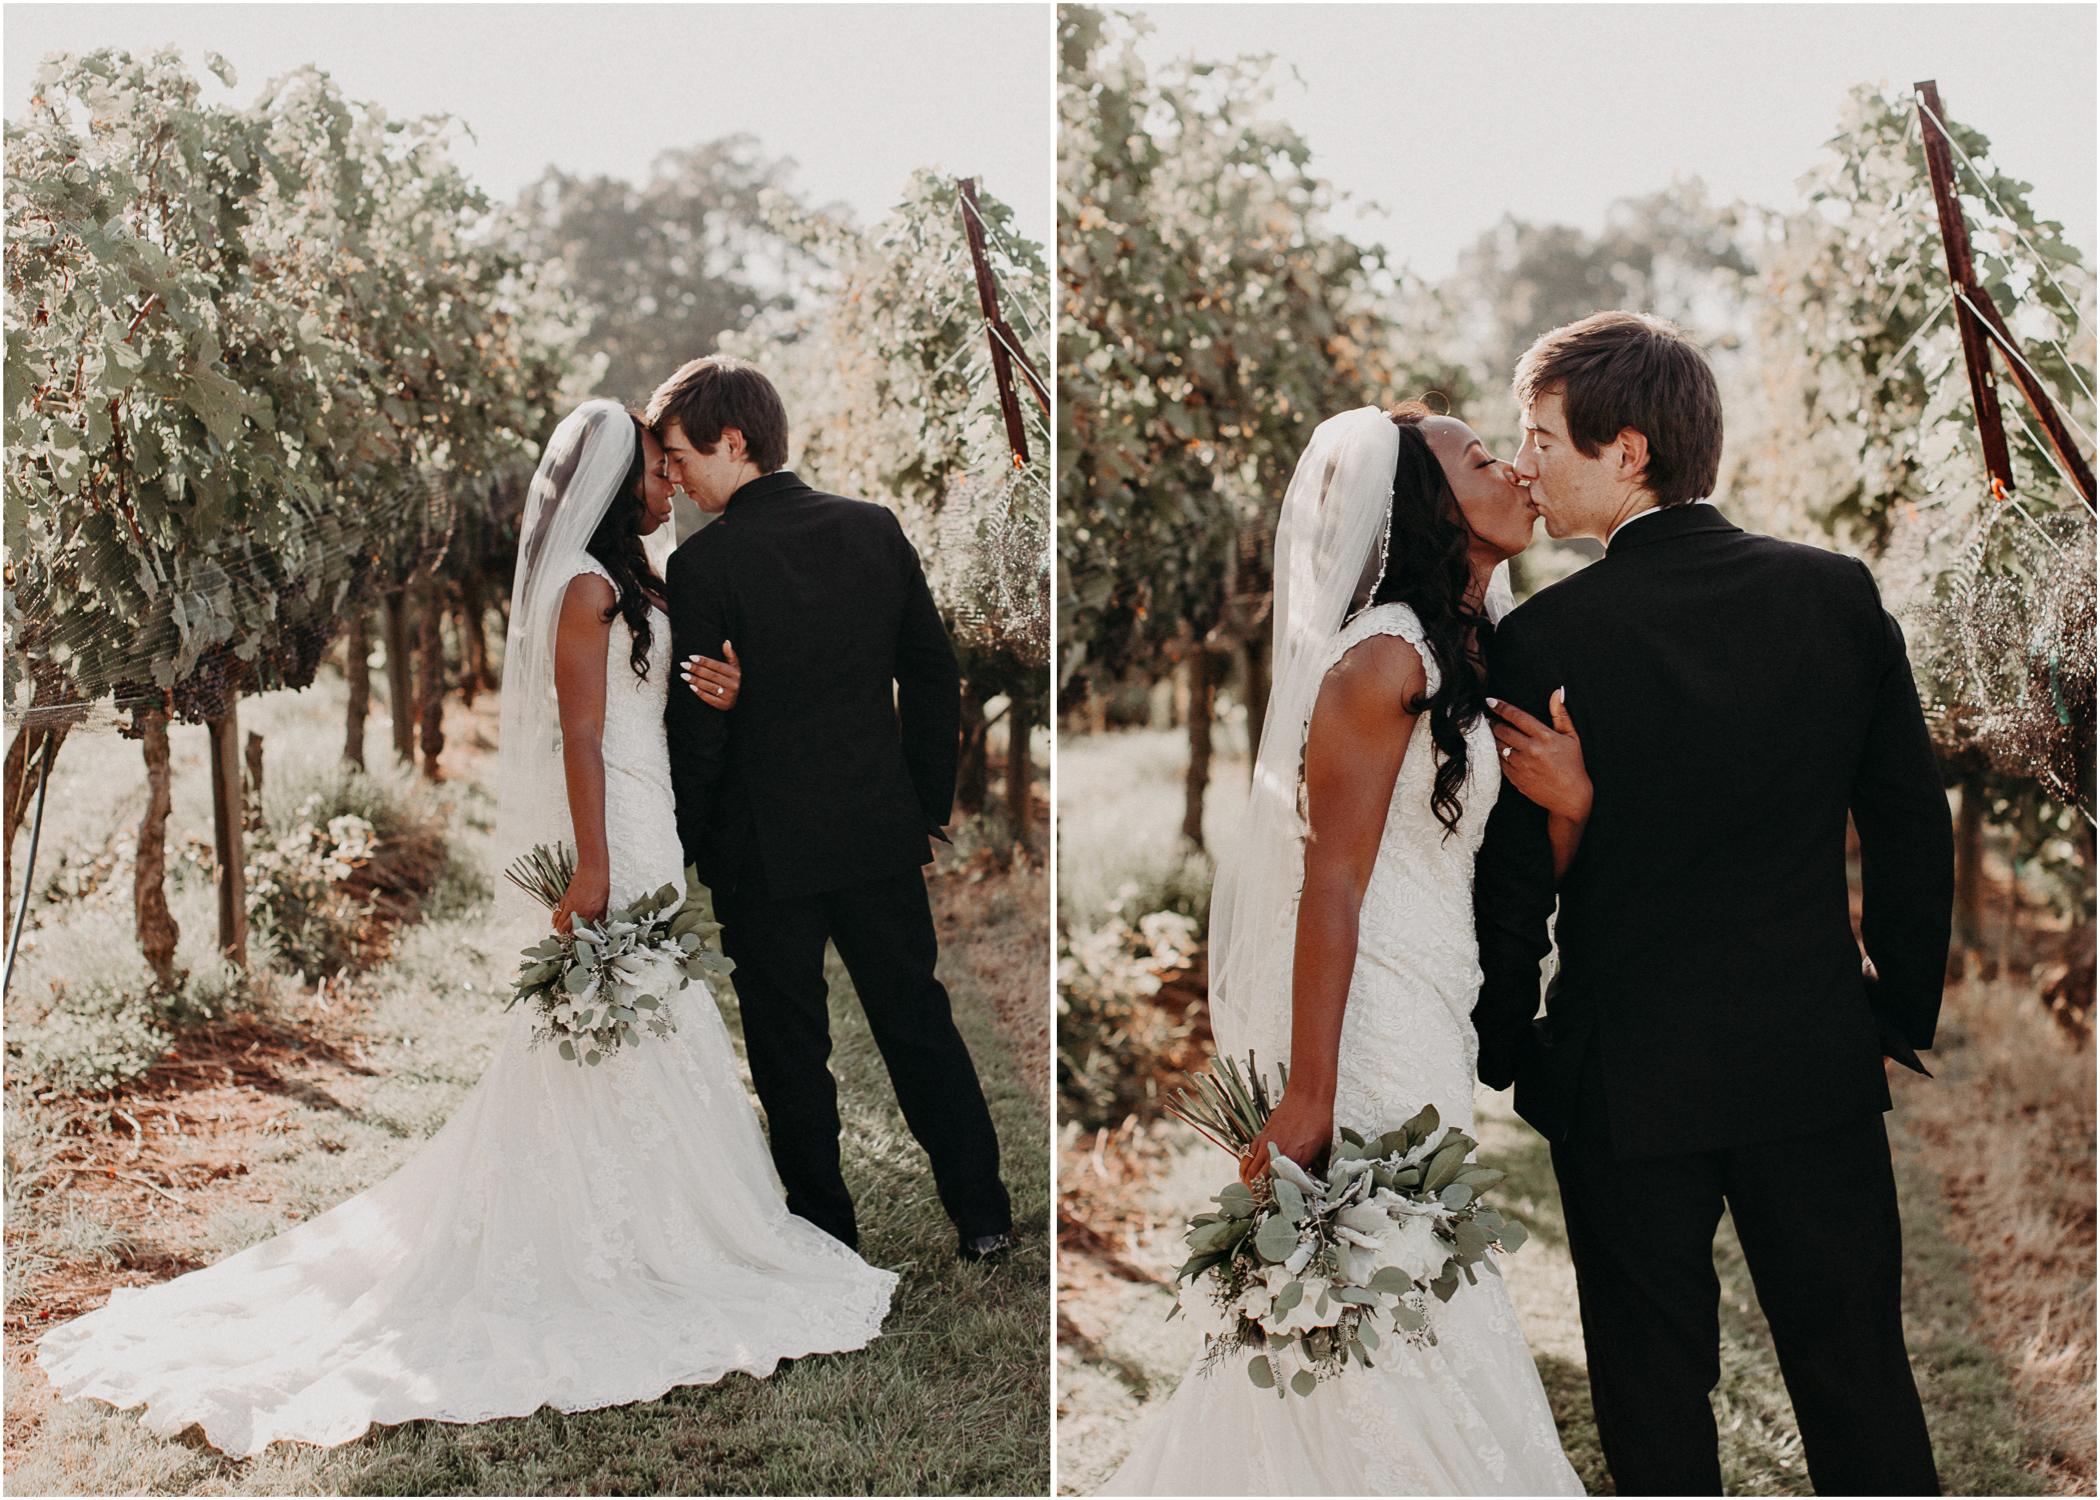 43- Kaya_vineyard_dahlonega_wedding_venue_Bride_and_groom_first_look_and_portraits_aline_marin_photography.jpg